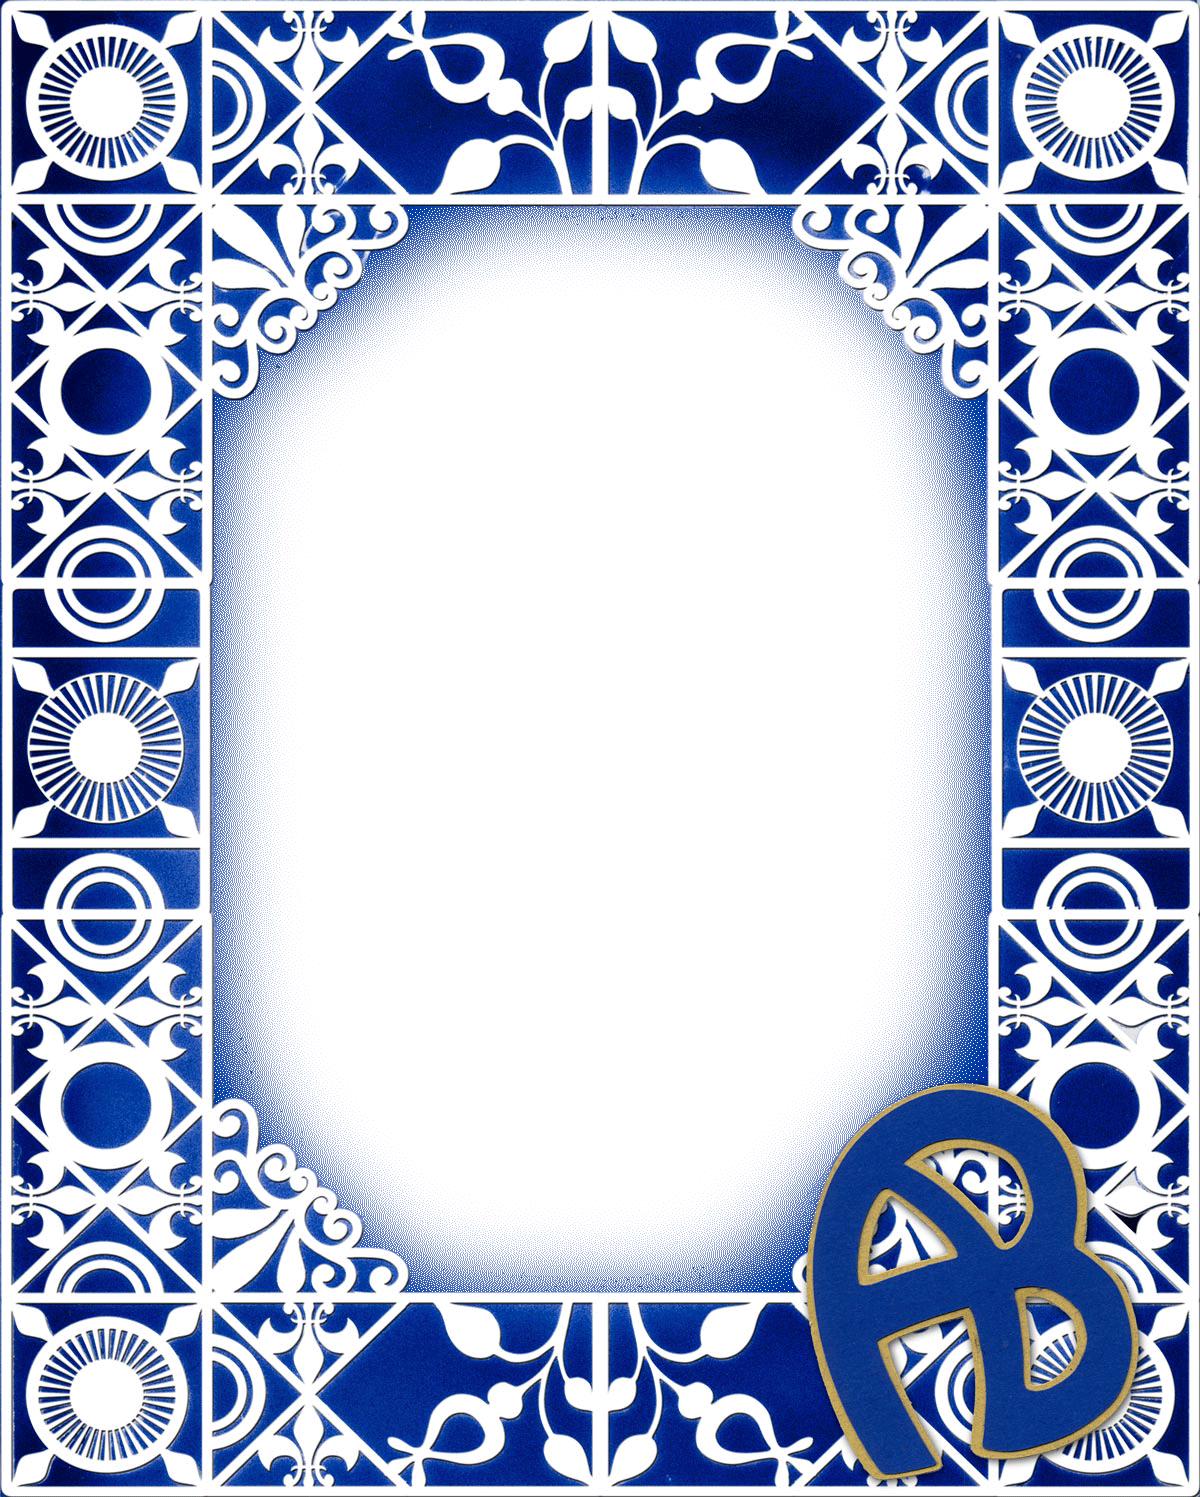 Acton boxoboro frame ursulas digital mixed media rosette stencil rectangle frame blue for web jeuxipadfo Image collections